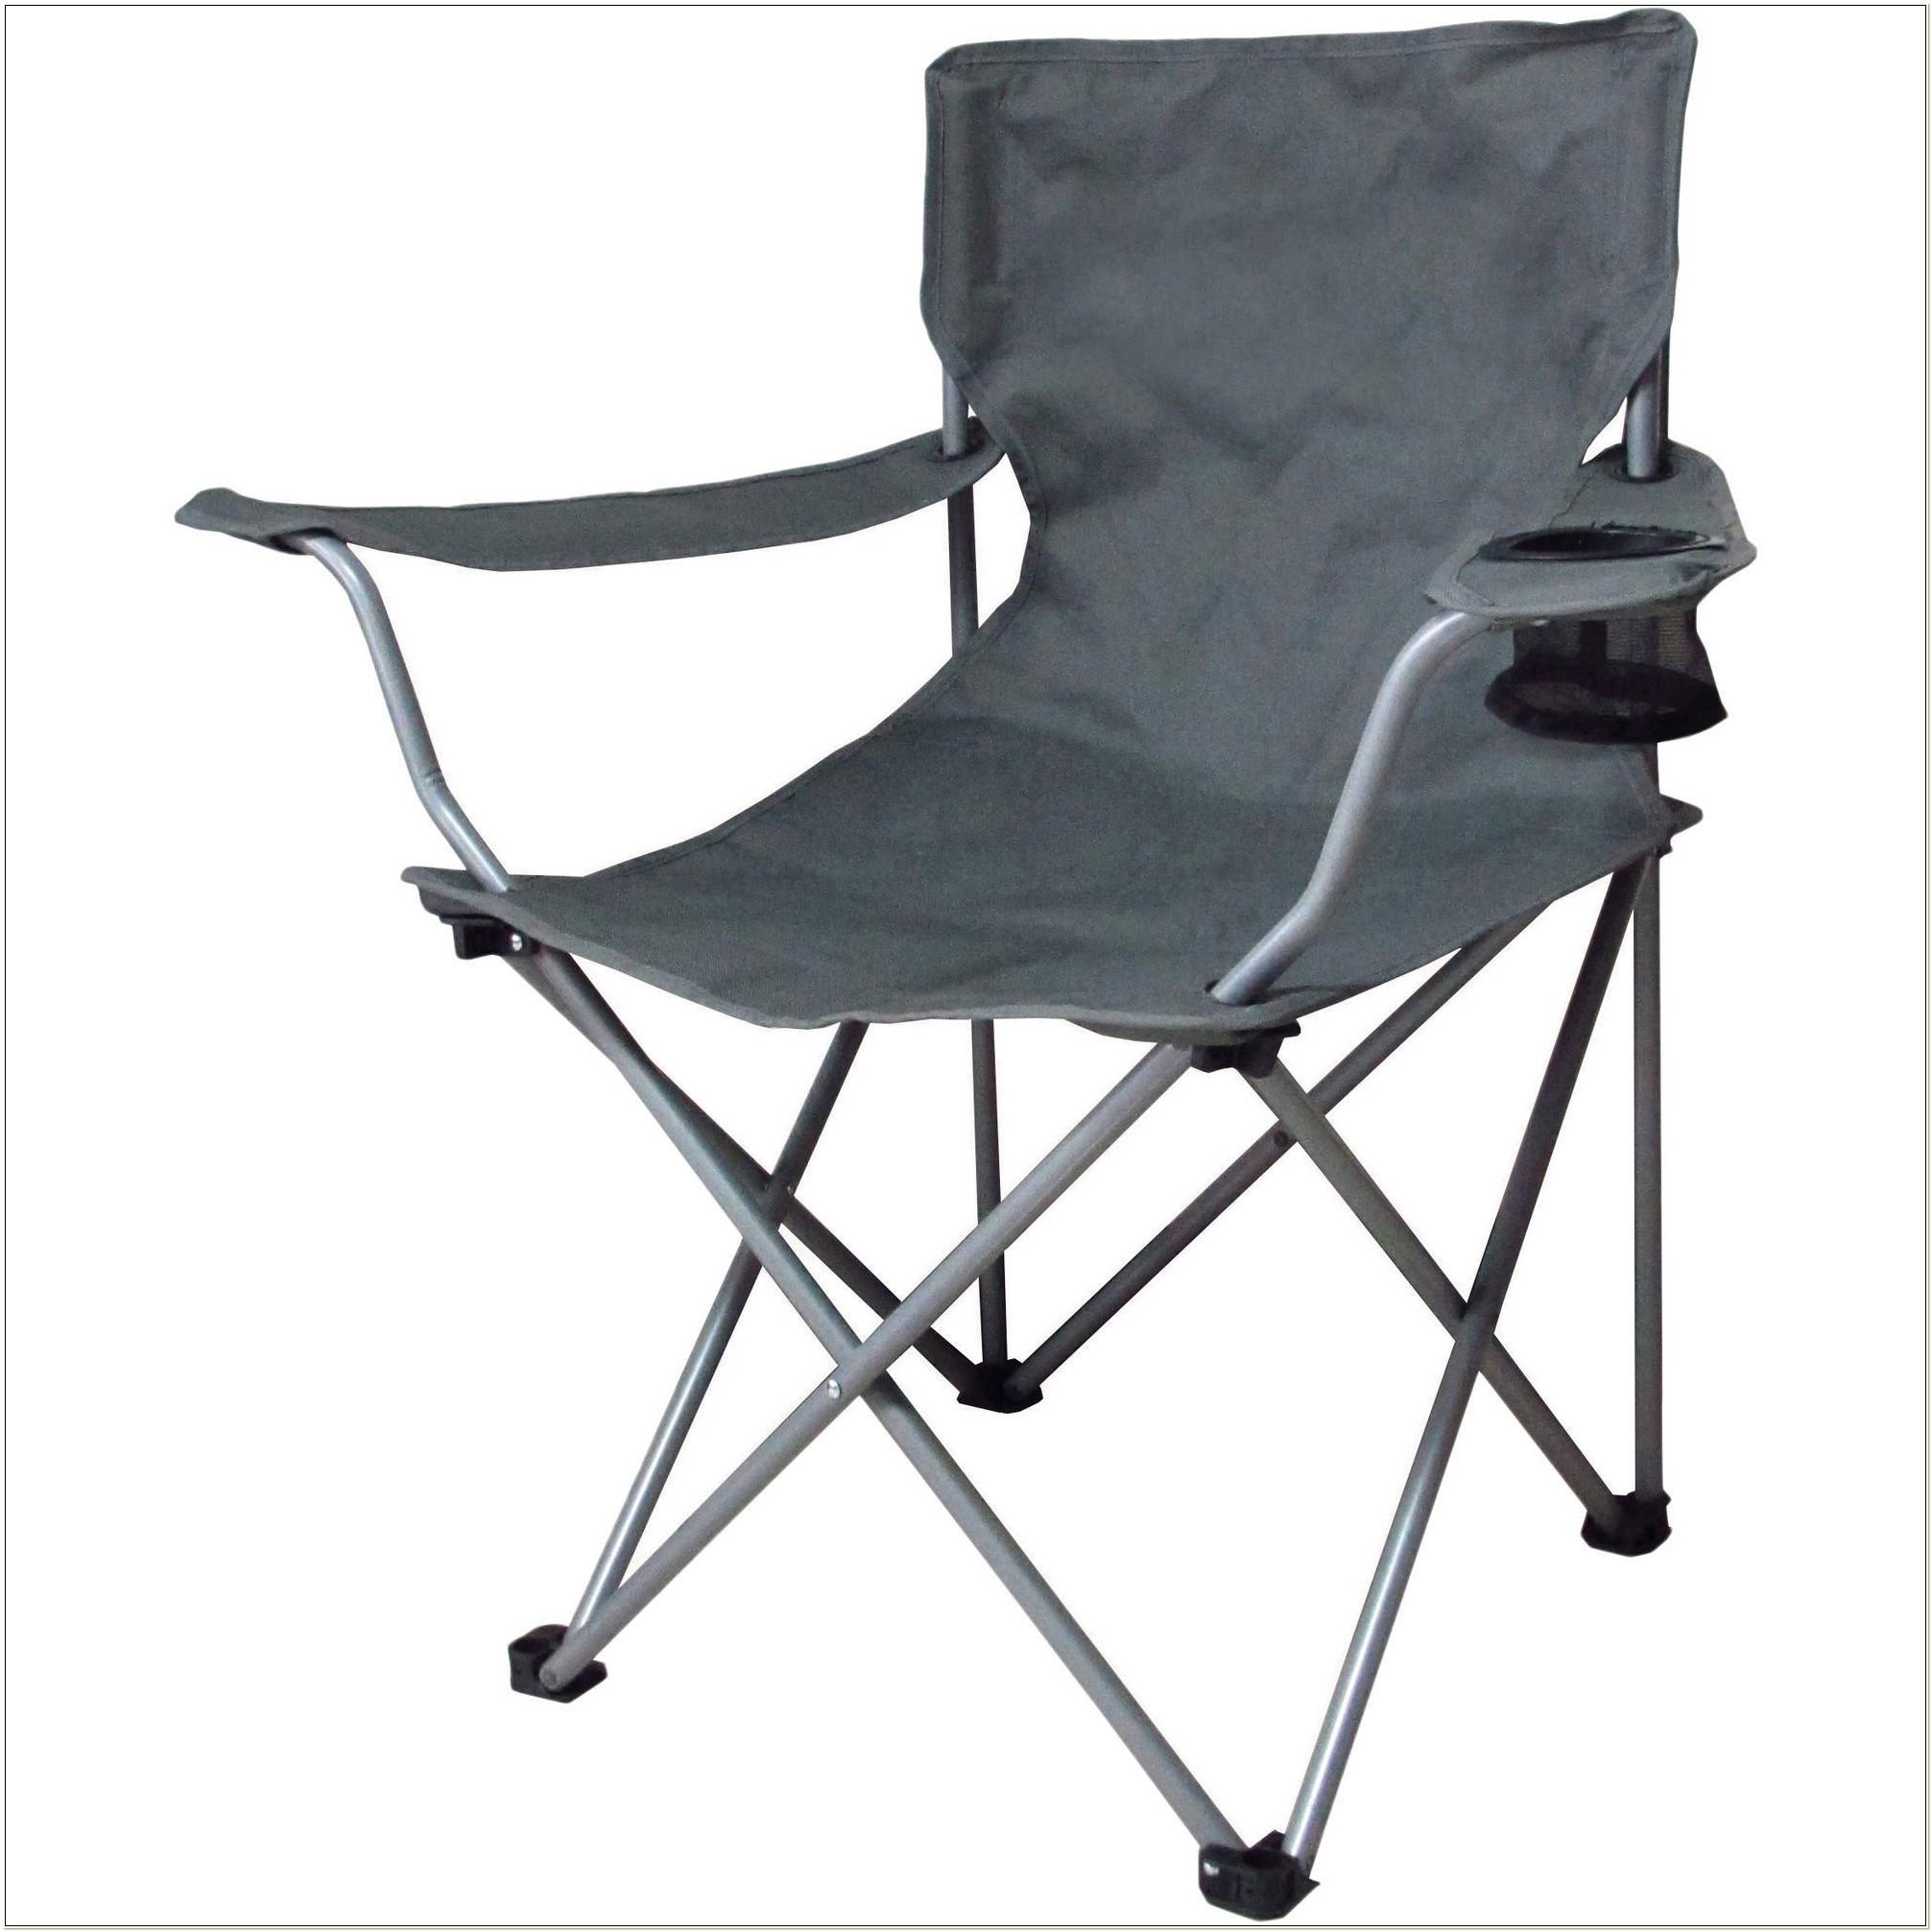 Folding Chairs At Walmart